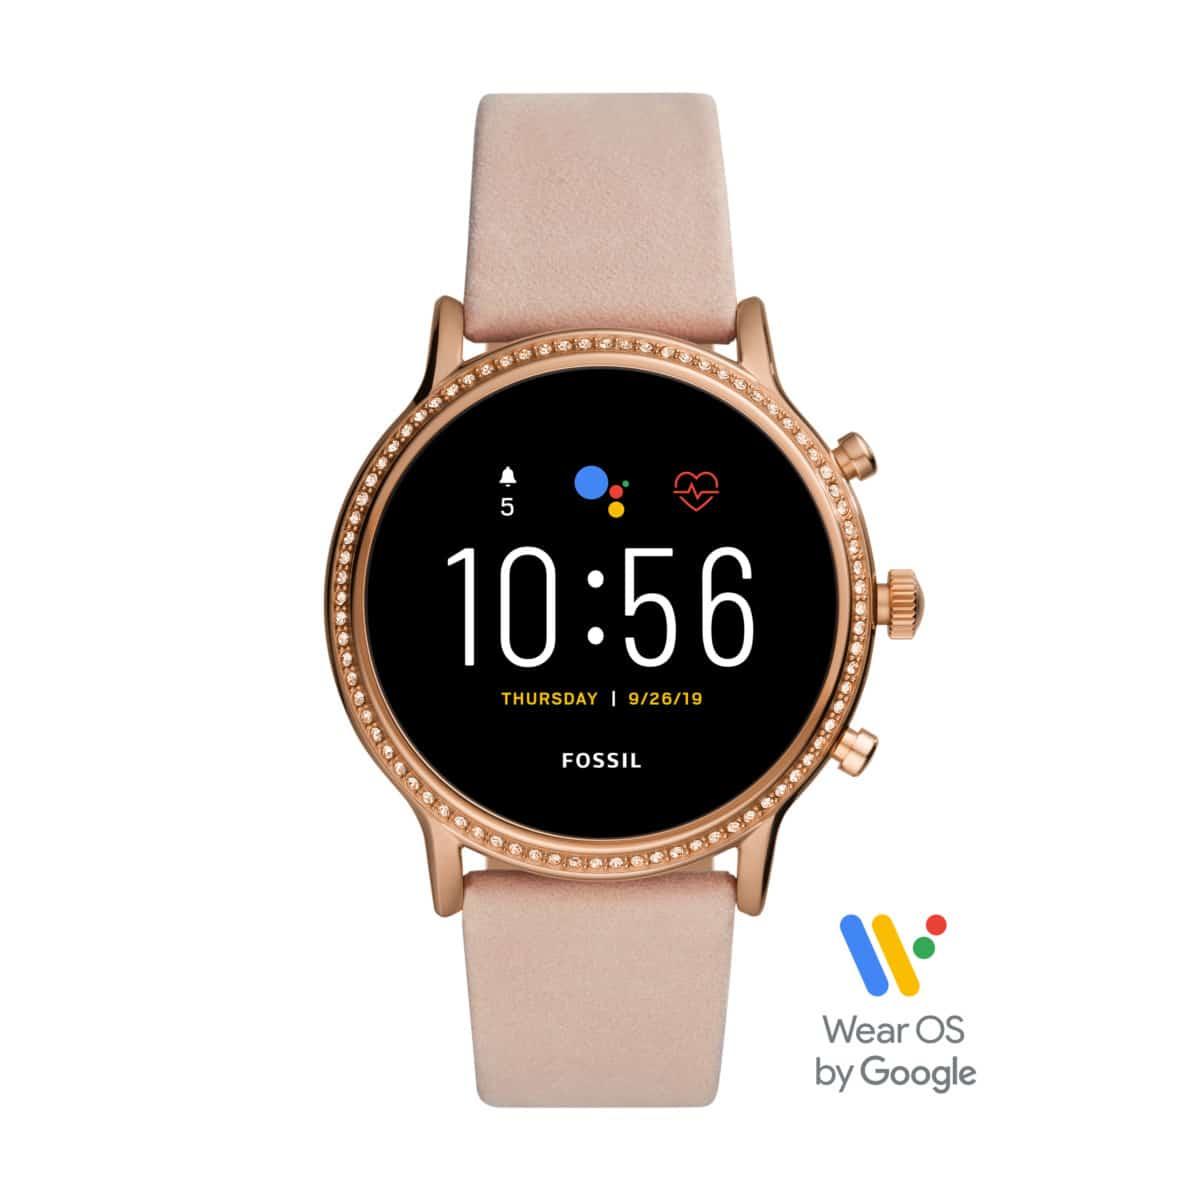 Fossil Gen 5 Smartwatch 4